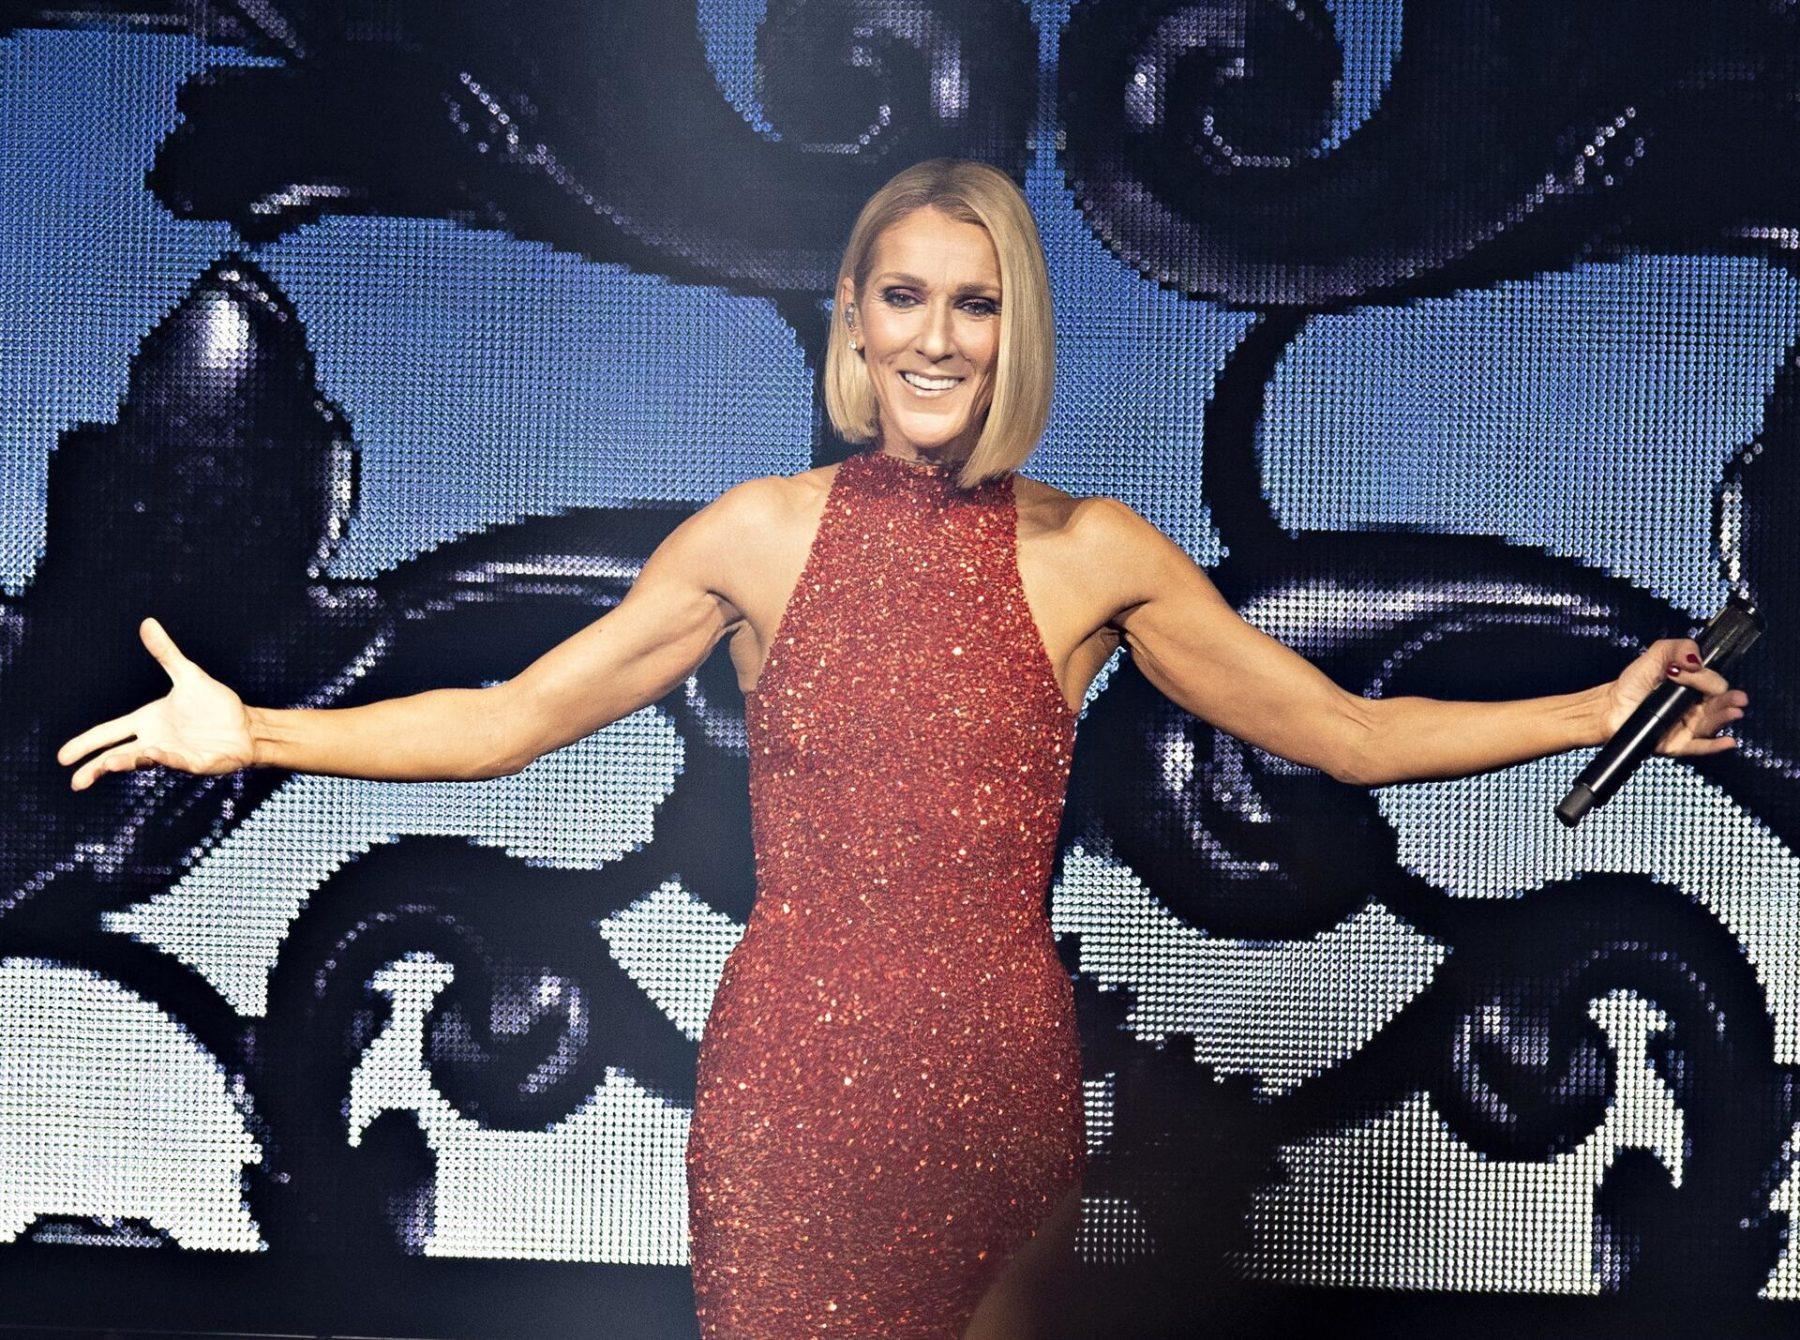 H Celine Dion επαναπρογραμματίζει το ραντεβού της με το ελληνικό κοινό